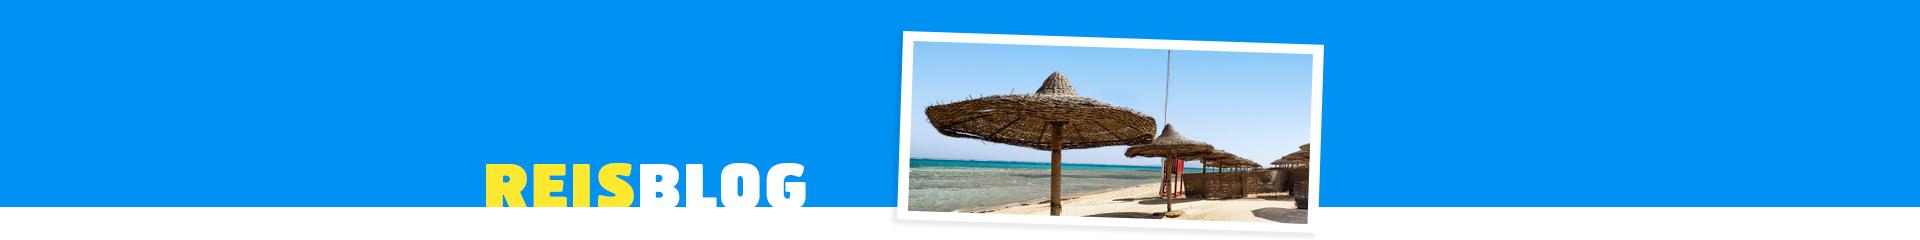 Strand met parasols in Egypte